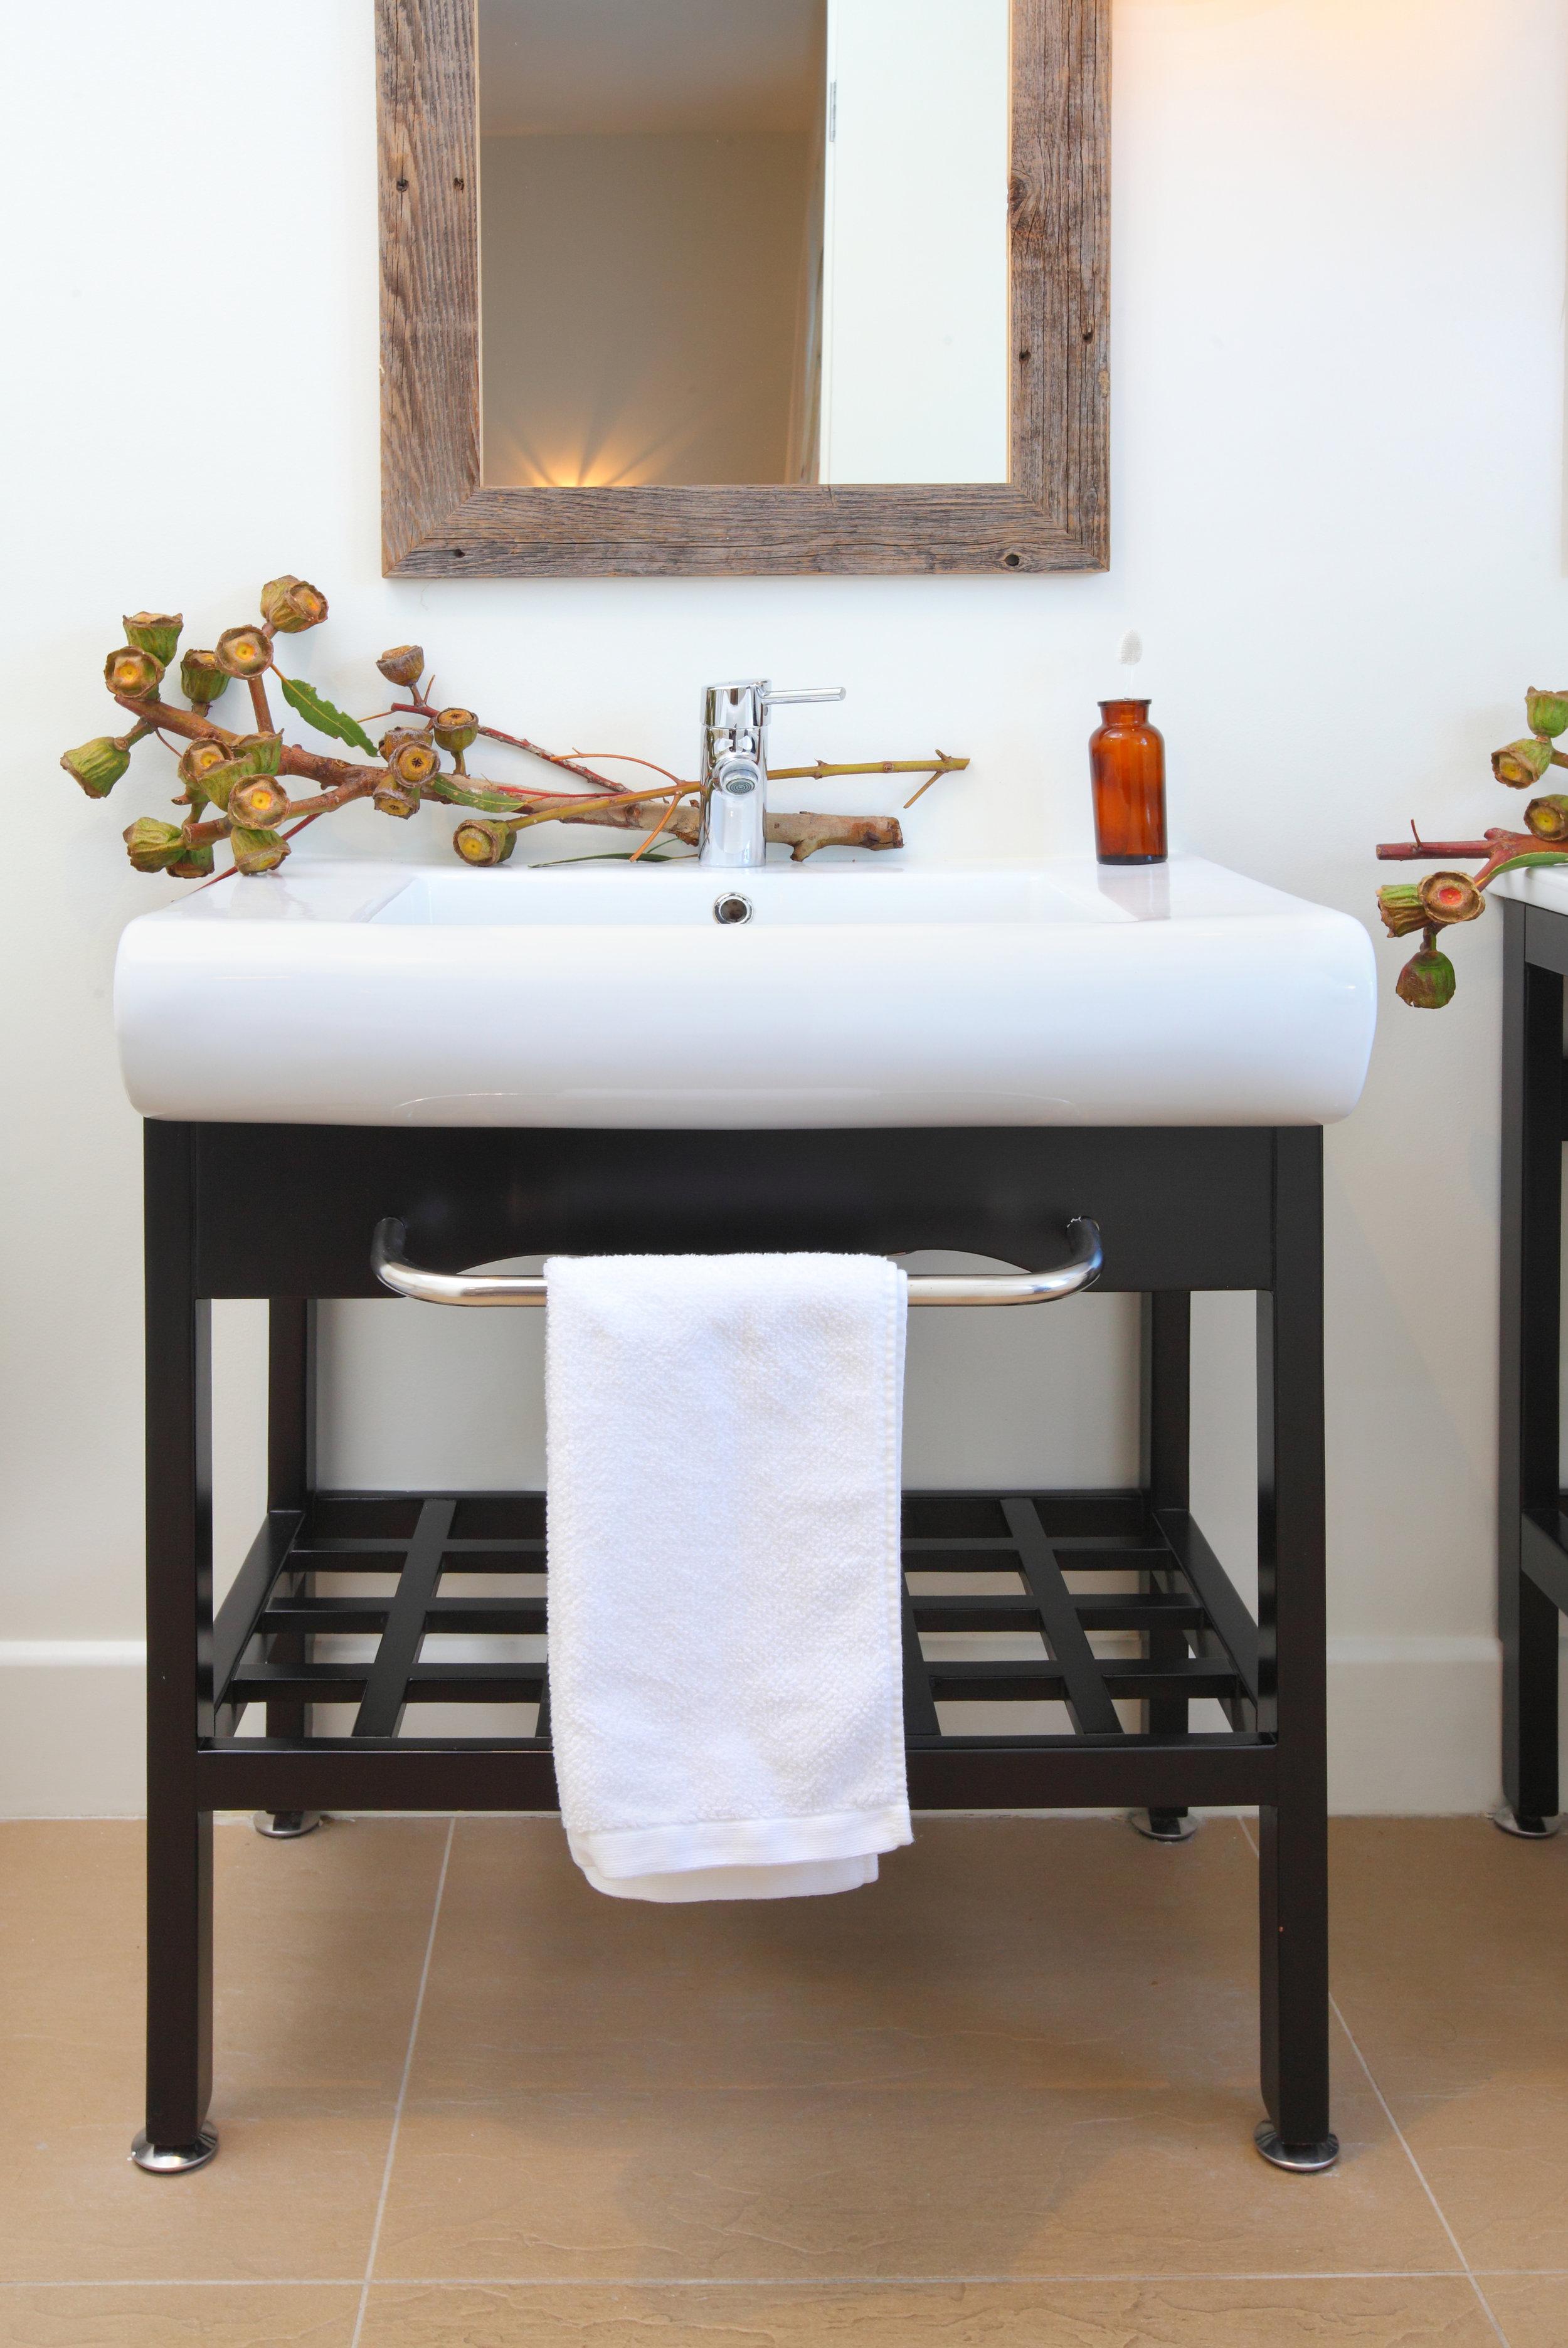 Sarah-barnard-design-modern-luxury-bathroom-sink.jpg